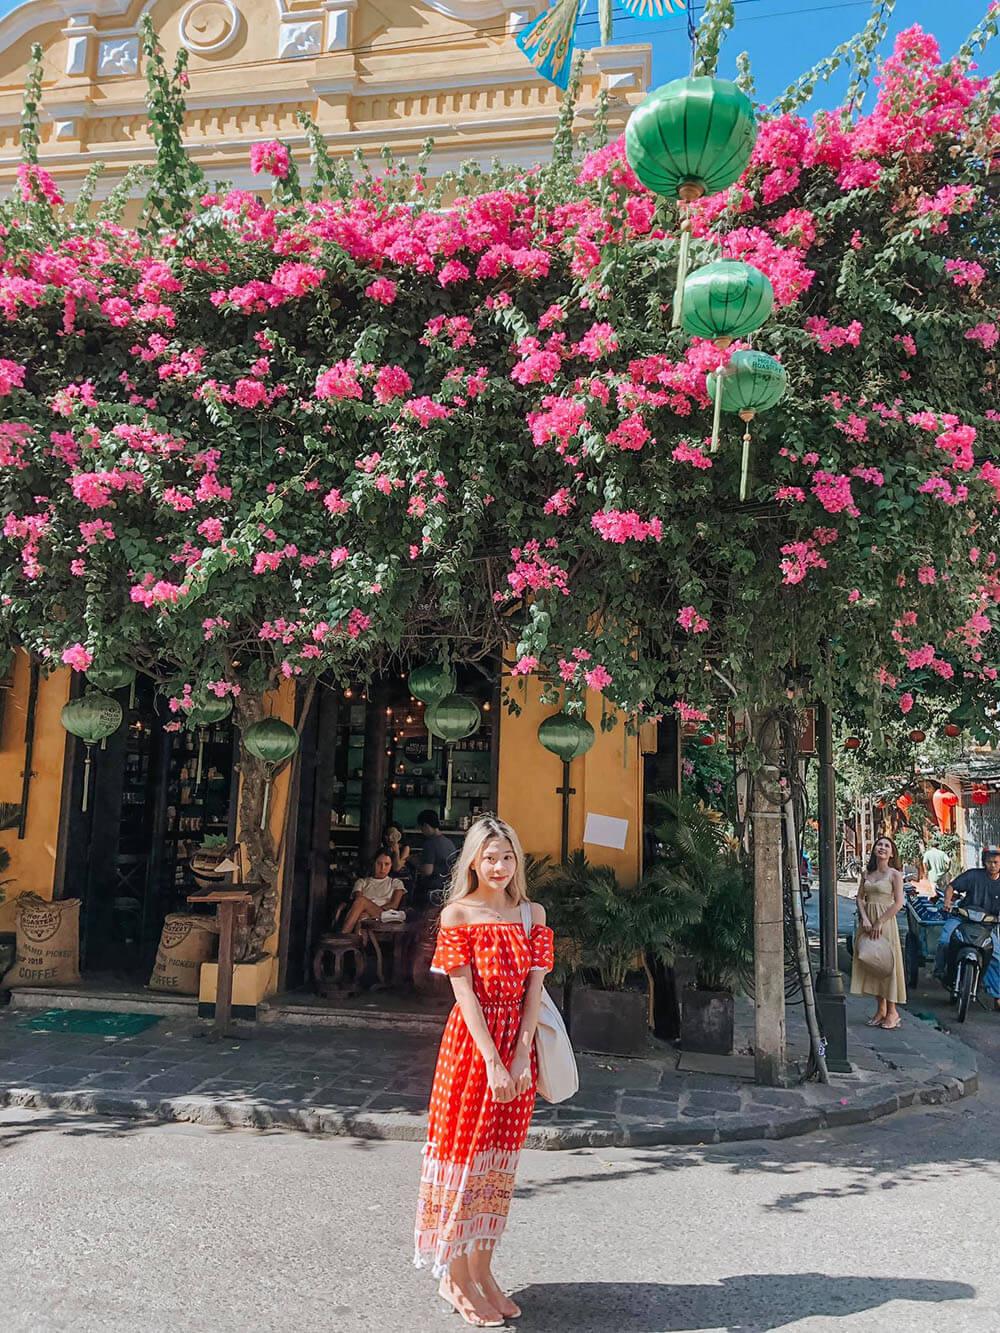 Hoa Giay Review Kinh Nghiem Kham Pha Hoi An Chi Trong 1 Ngay Danang Fantasticity Com 02